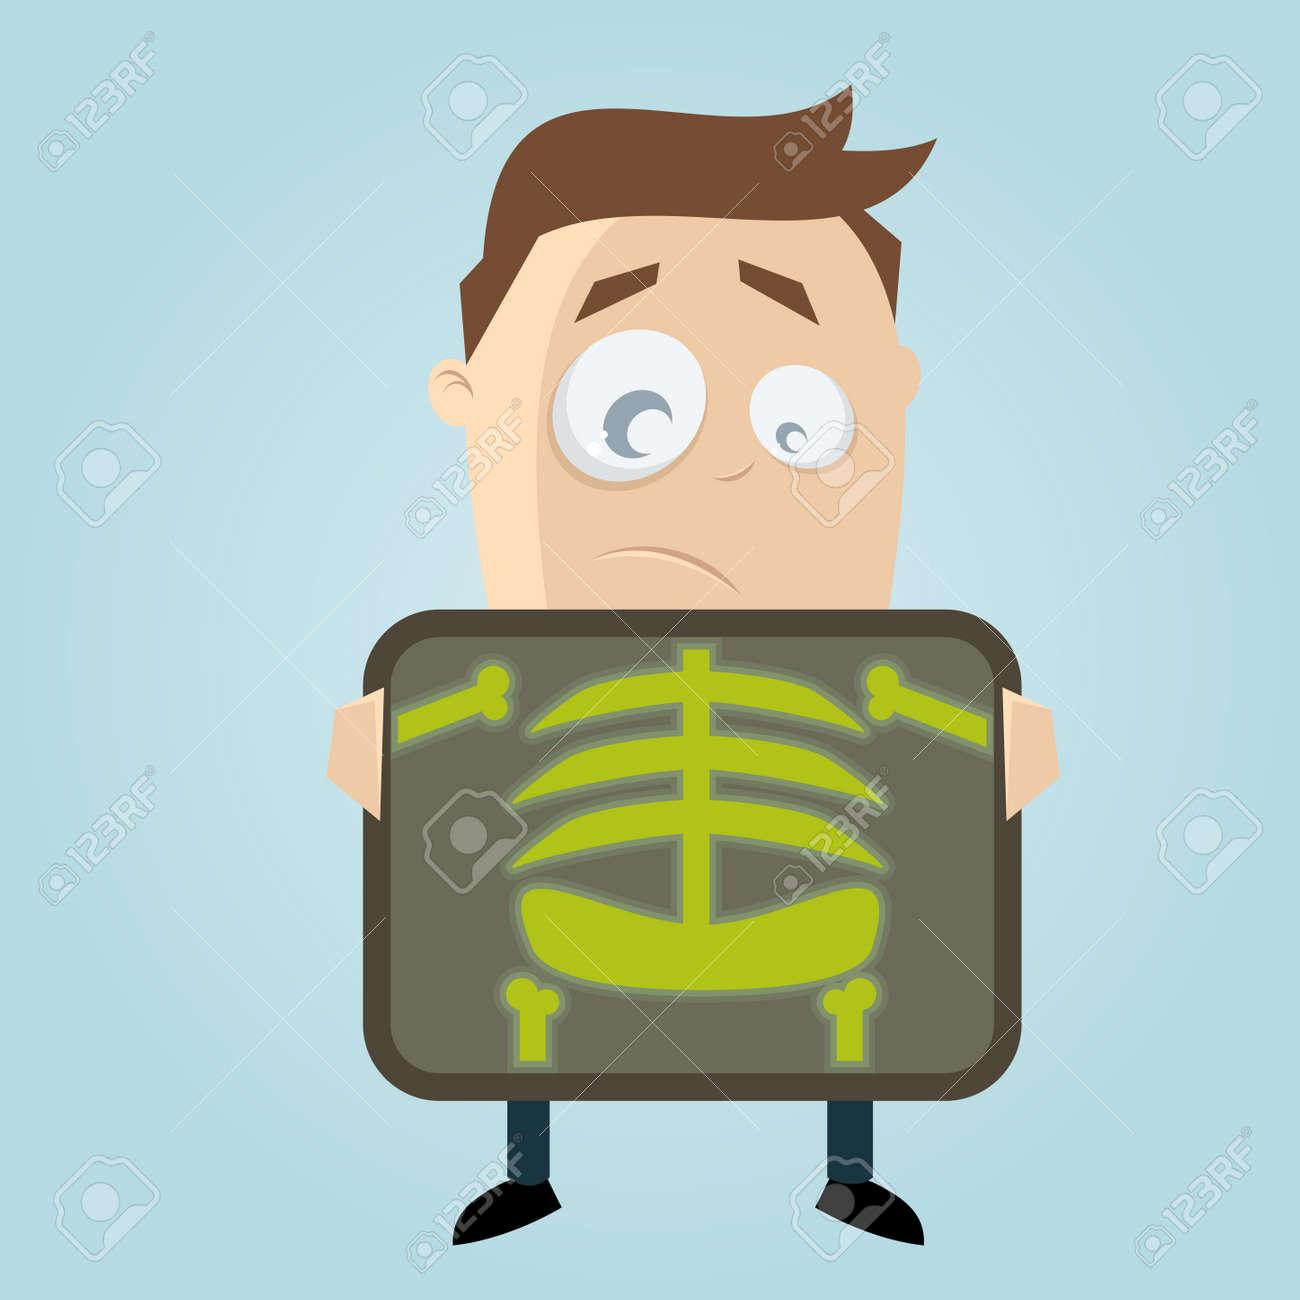 cartoon man is getting x-ray examination Stock Vector - 22469437